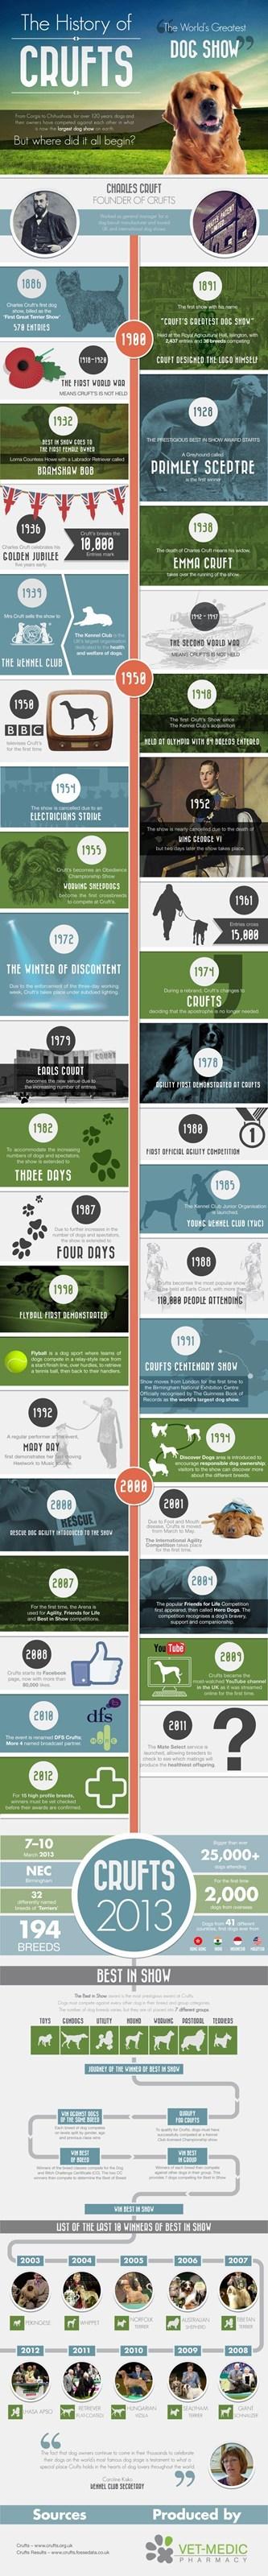 dog show history - 7514970624